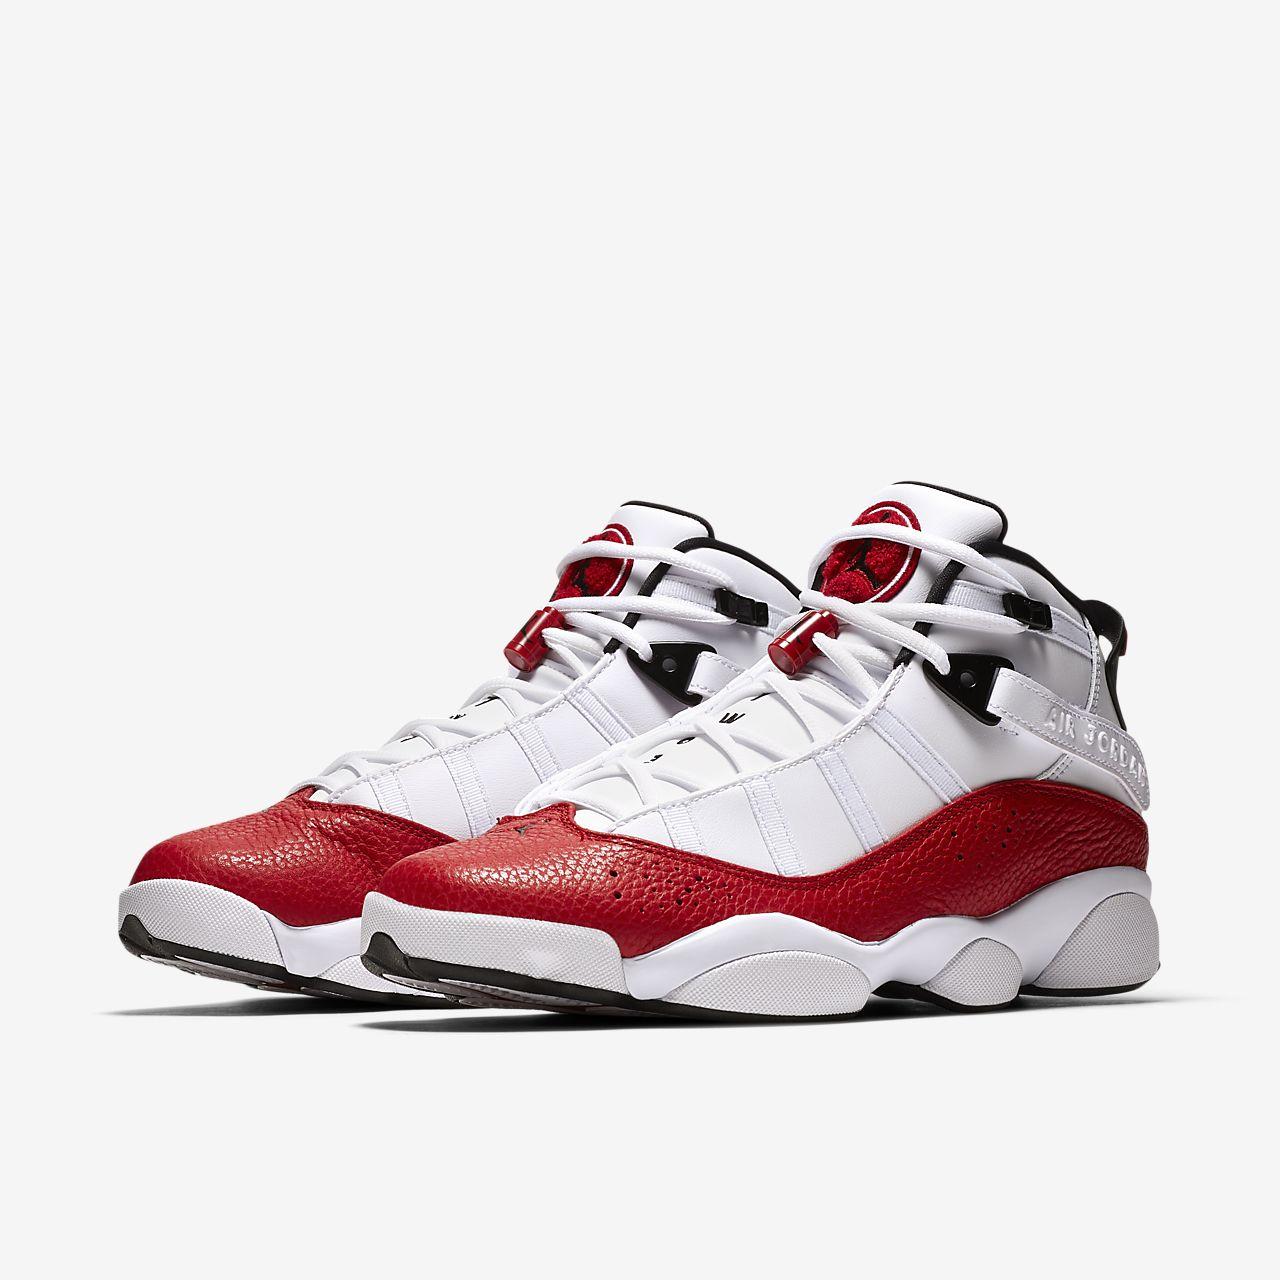 Find Nike Jordan 6 Cheap sale Black Red